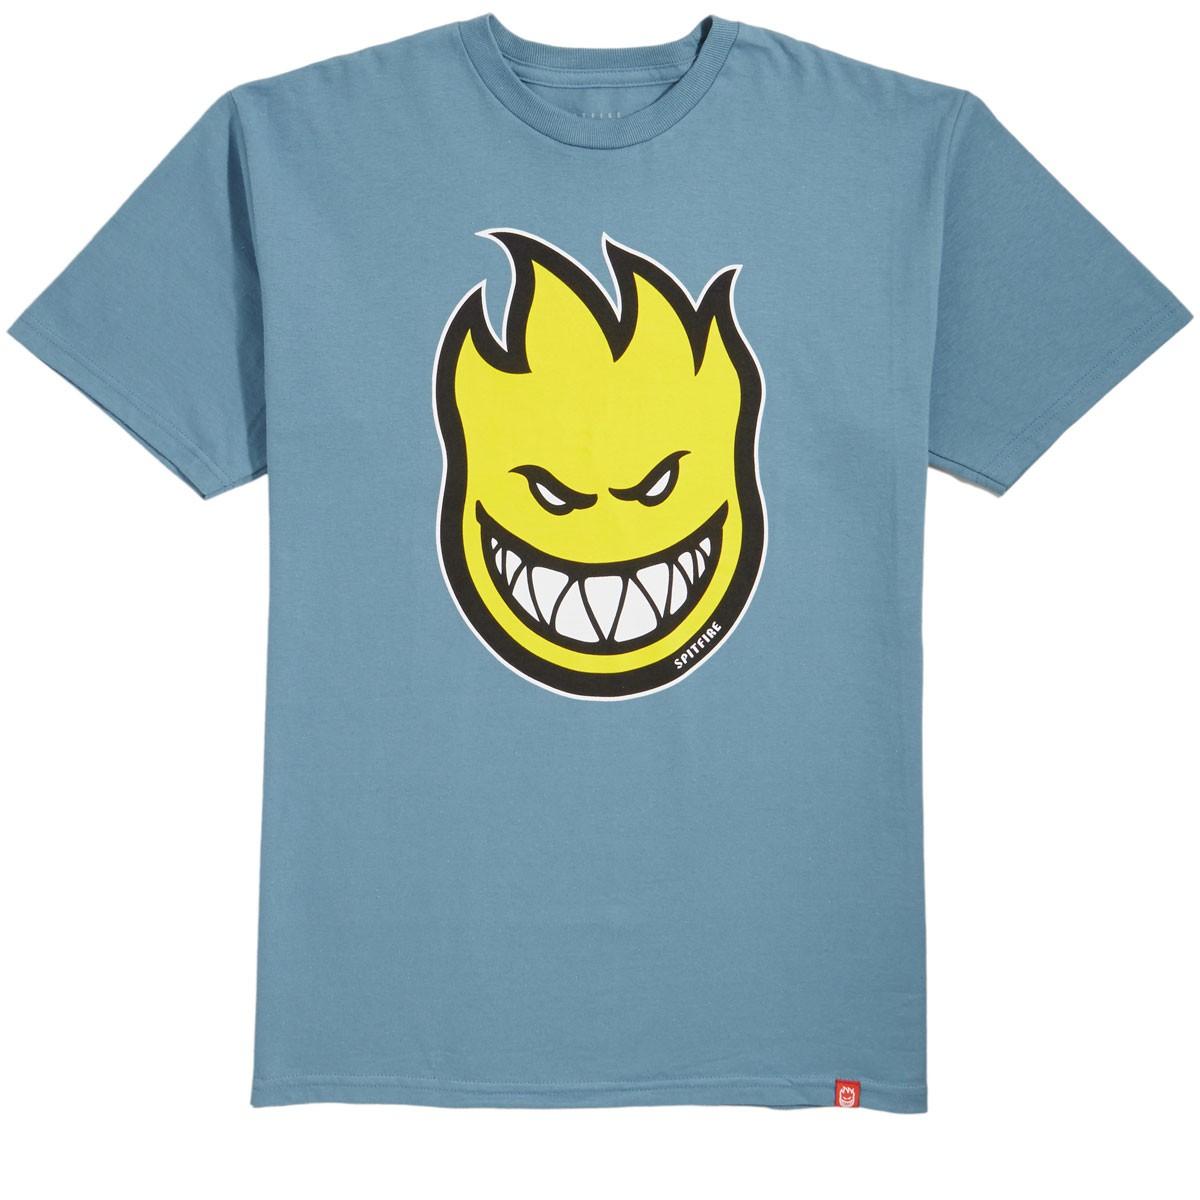 spitfire tee yellow logo blue tee